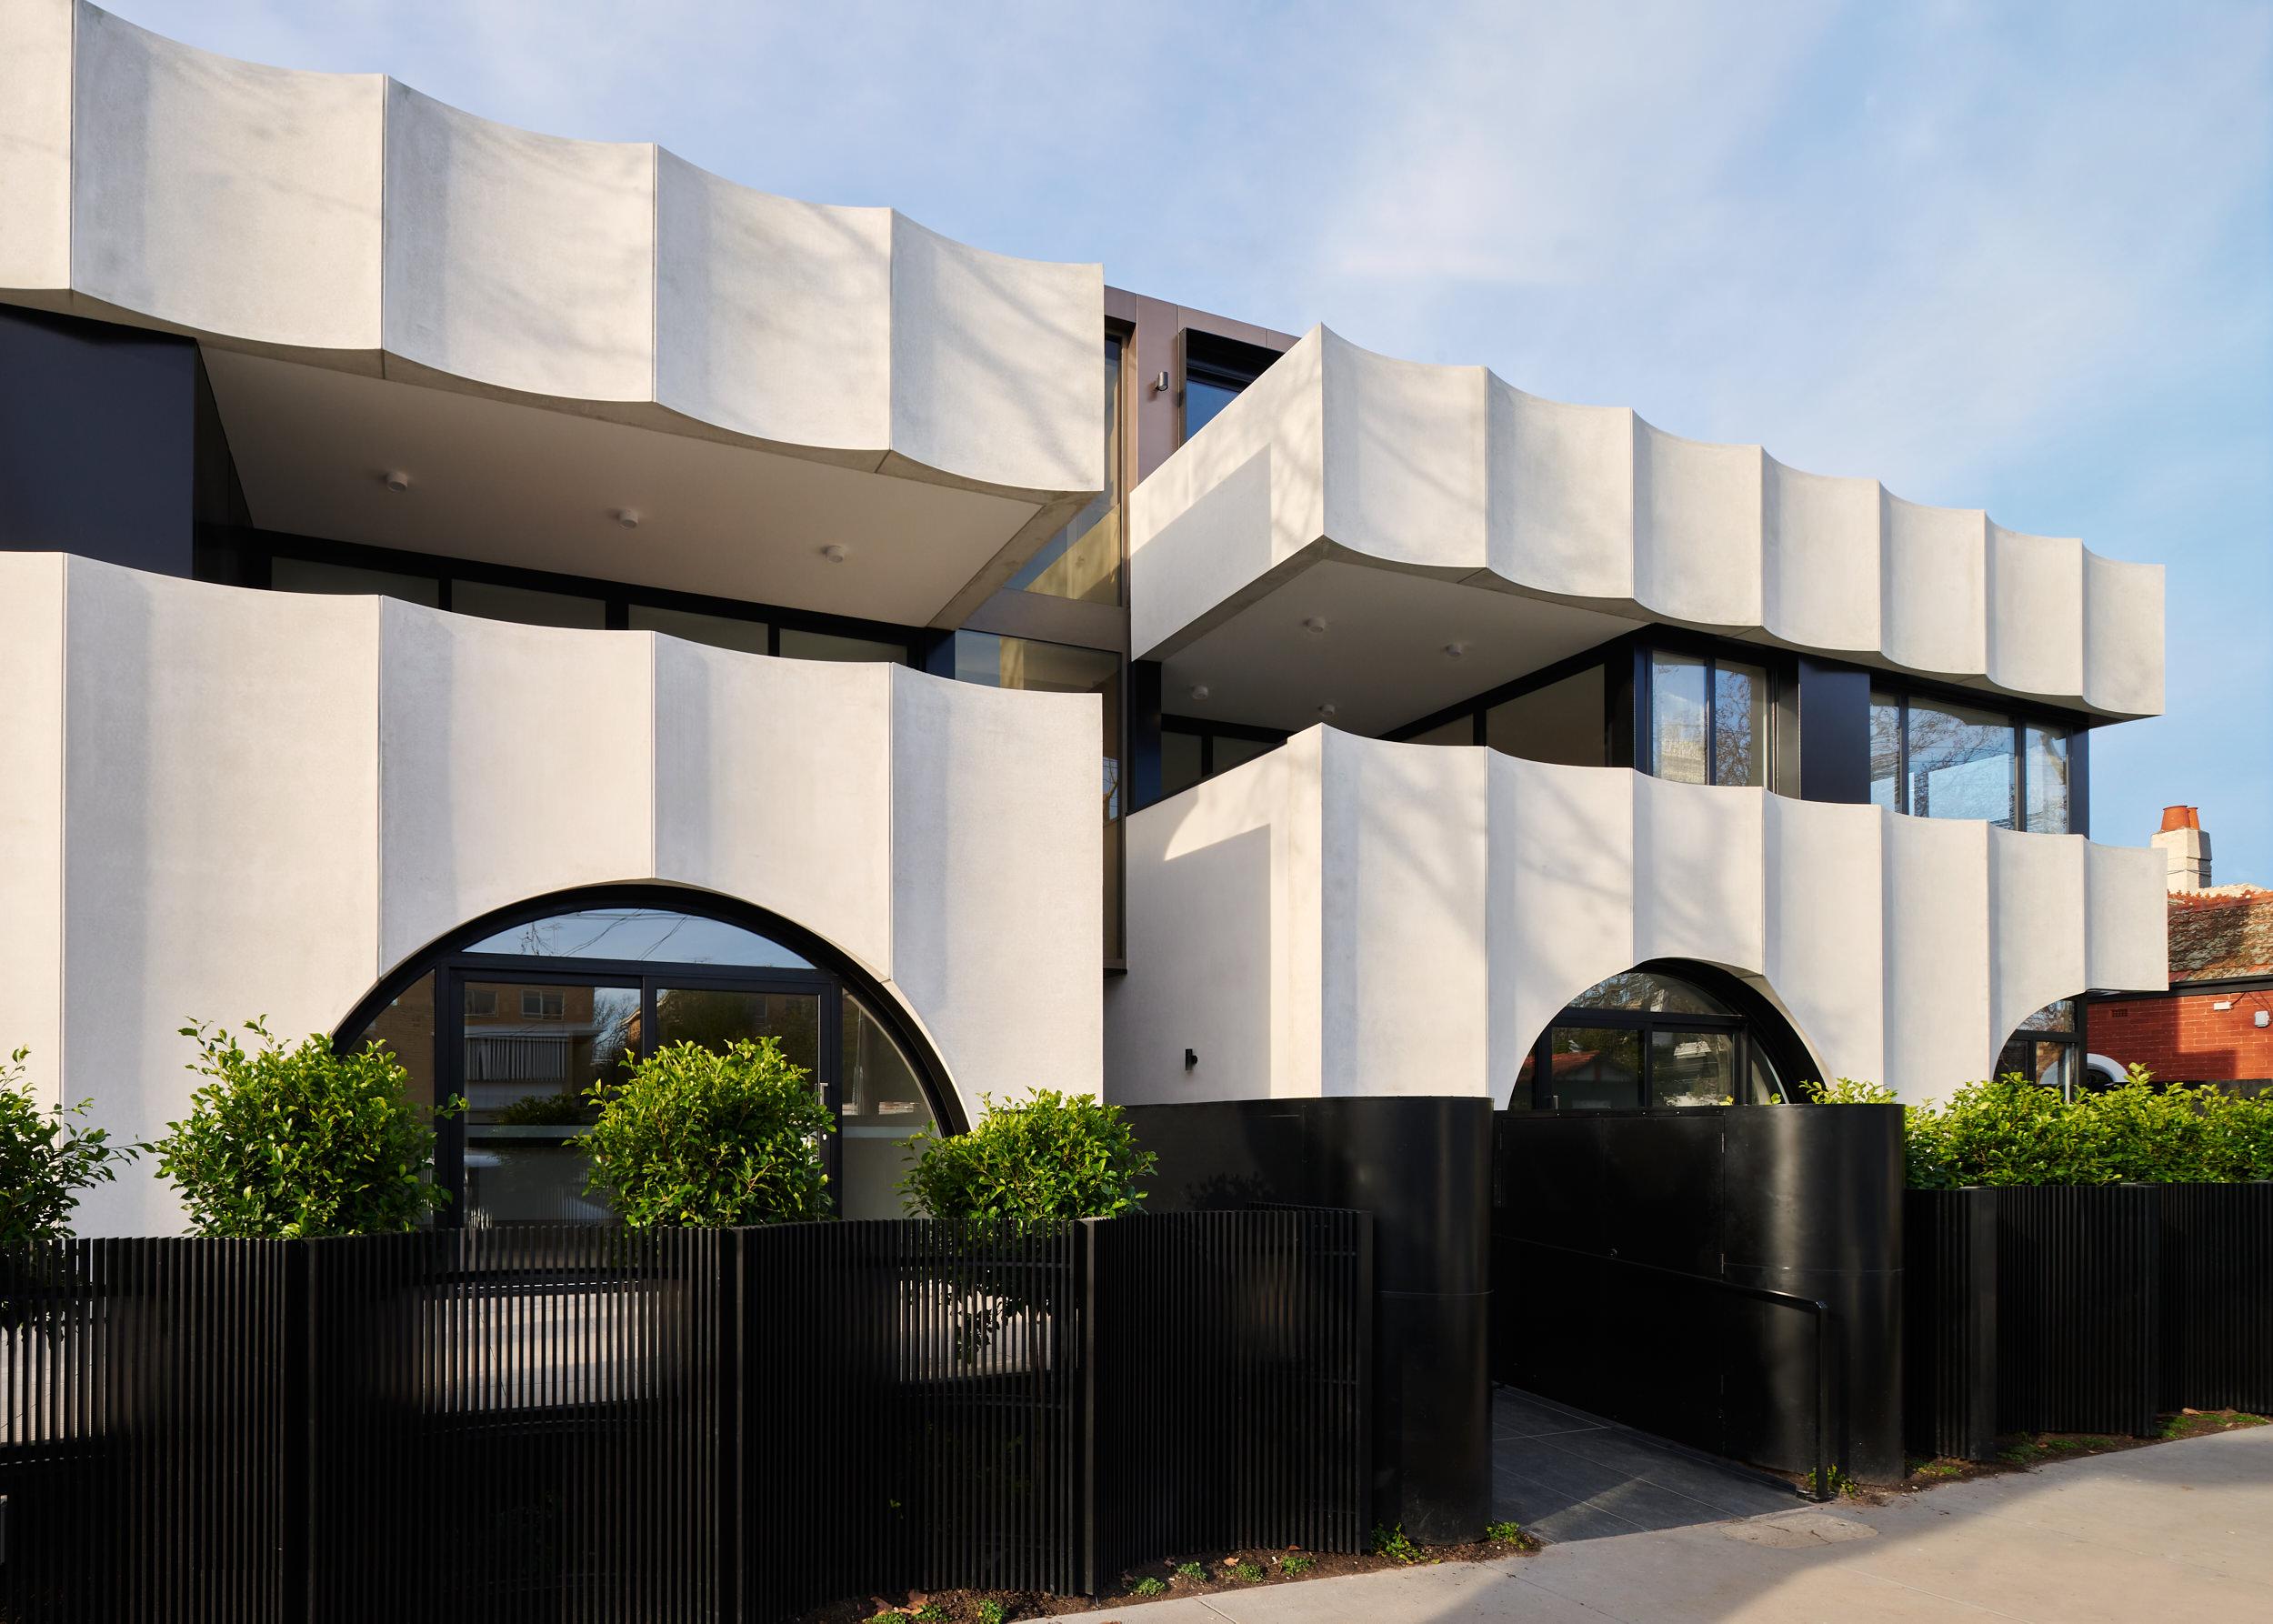 Ensemble Elwood Apartments designed by Kavellaris Urban Design